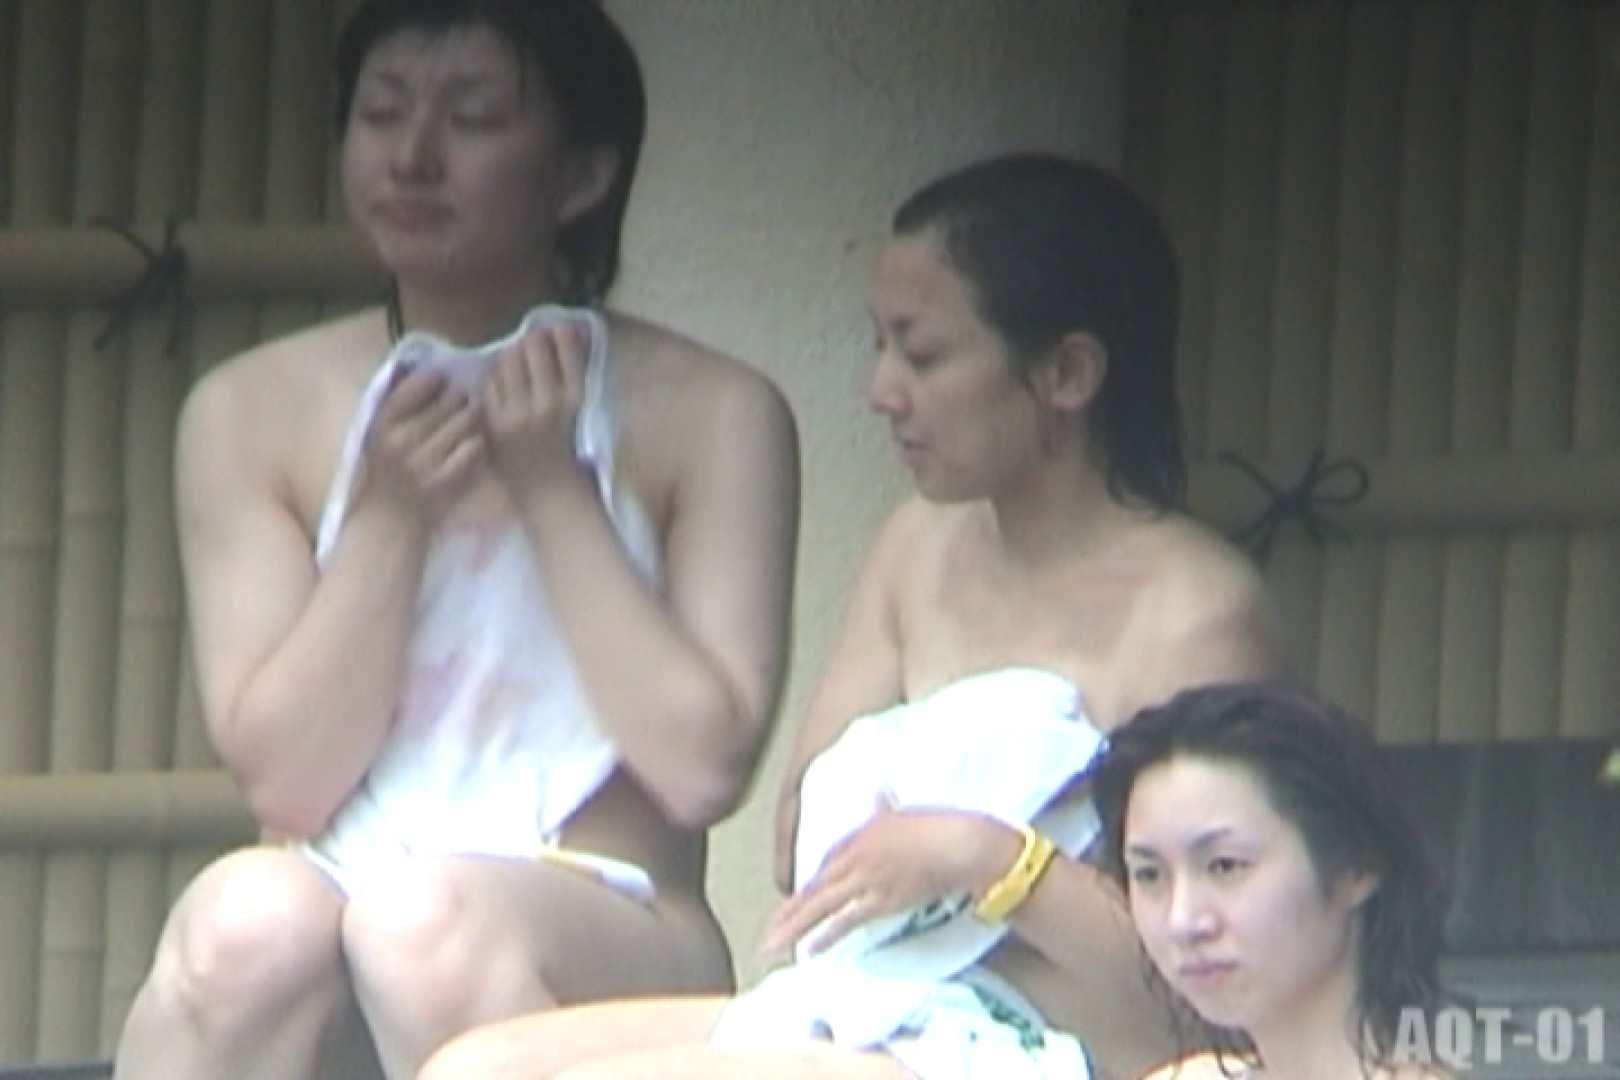 Aquaな露天風呂Vol.718 盗撮シリーズ | 露天風呂編  109PIX 47